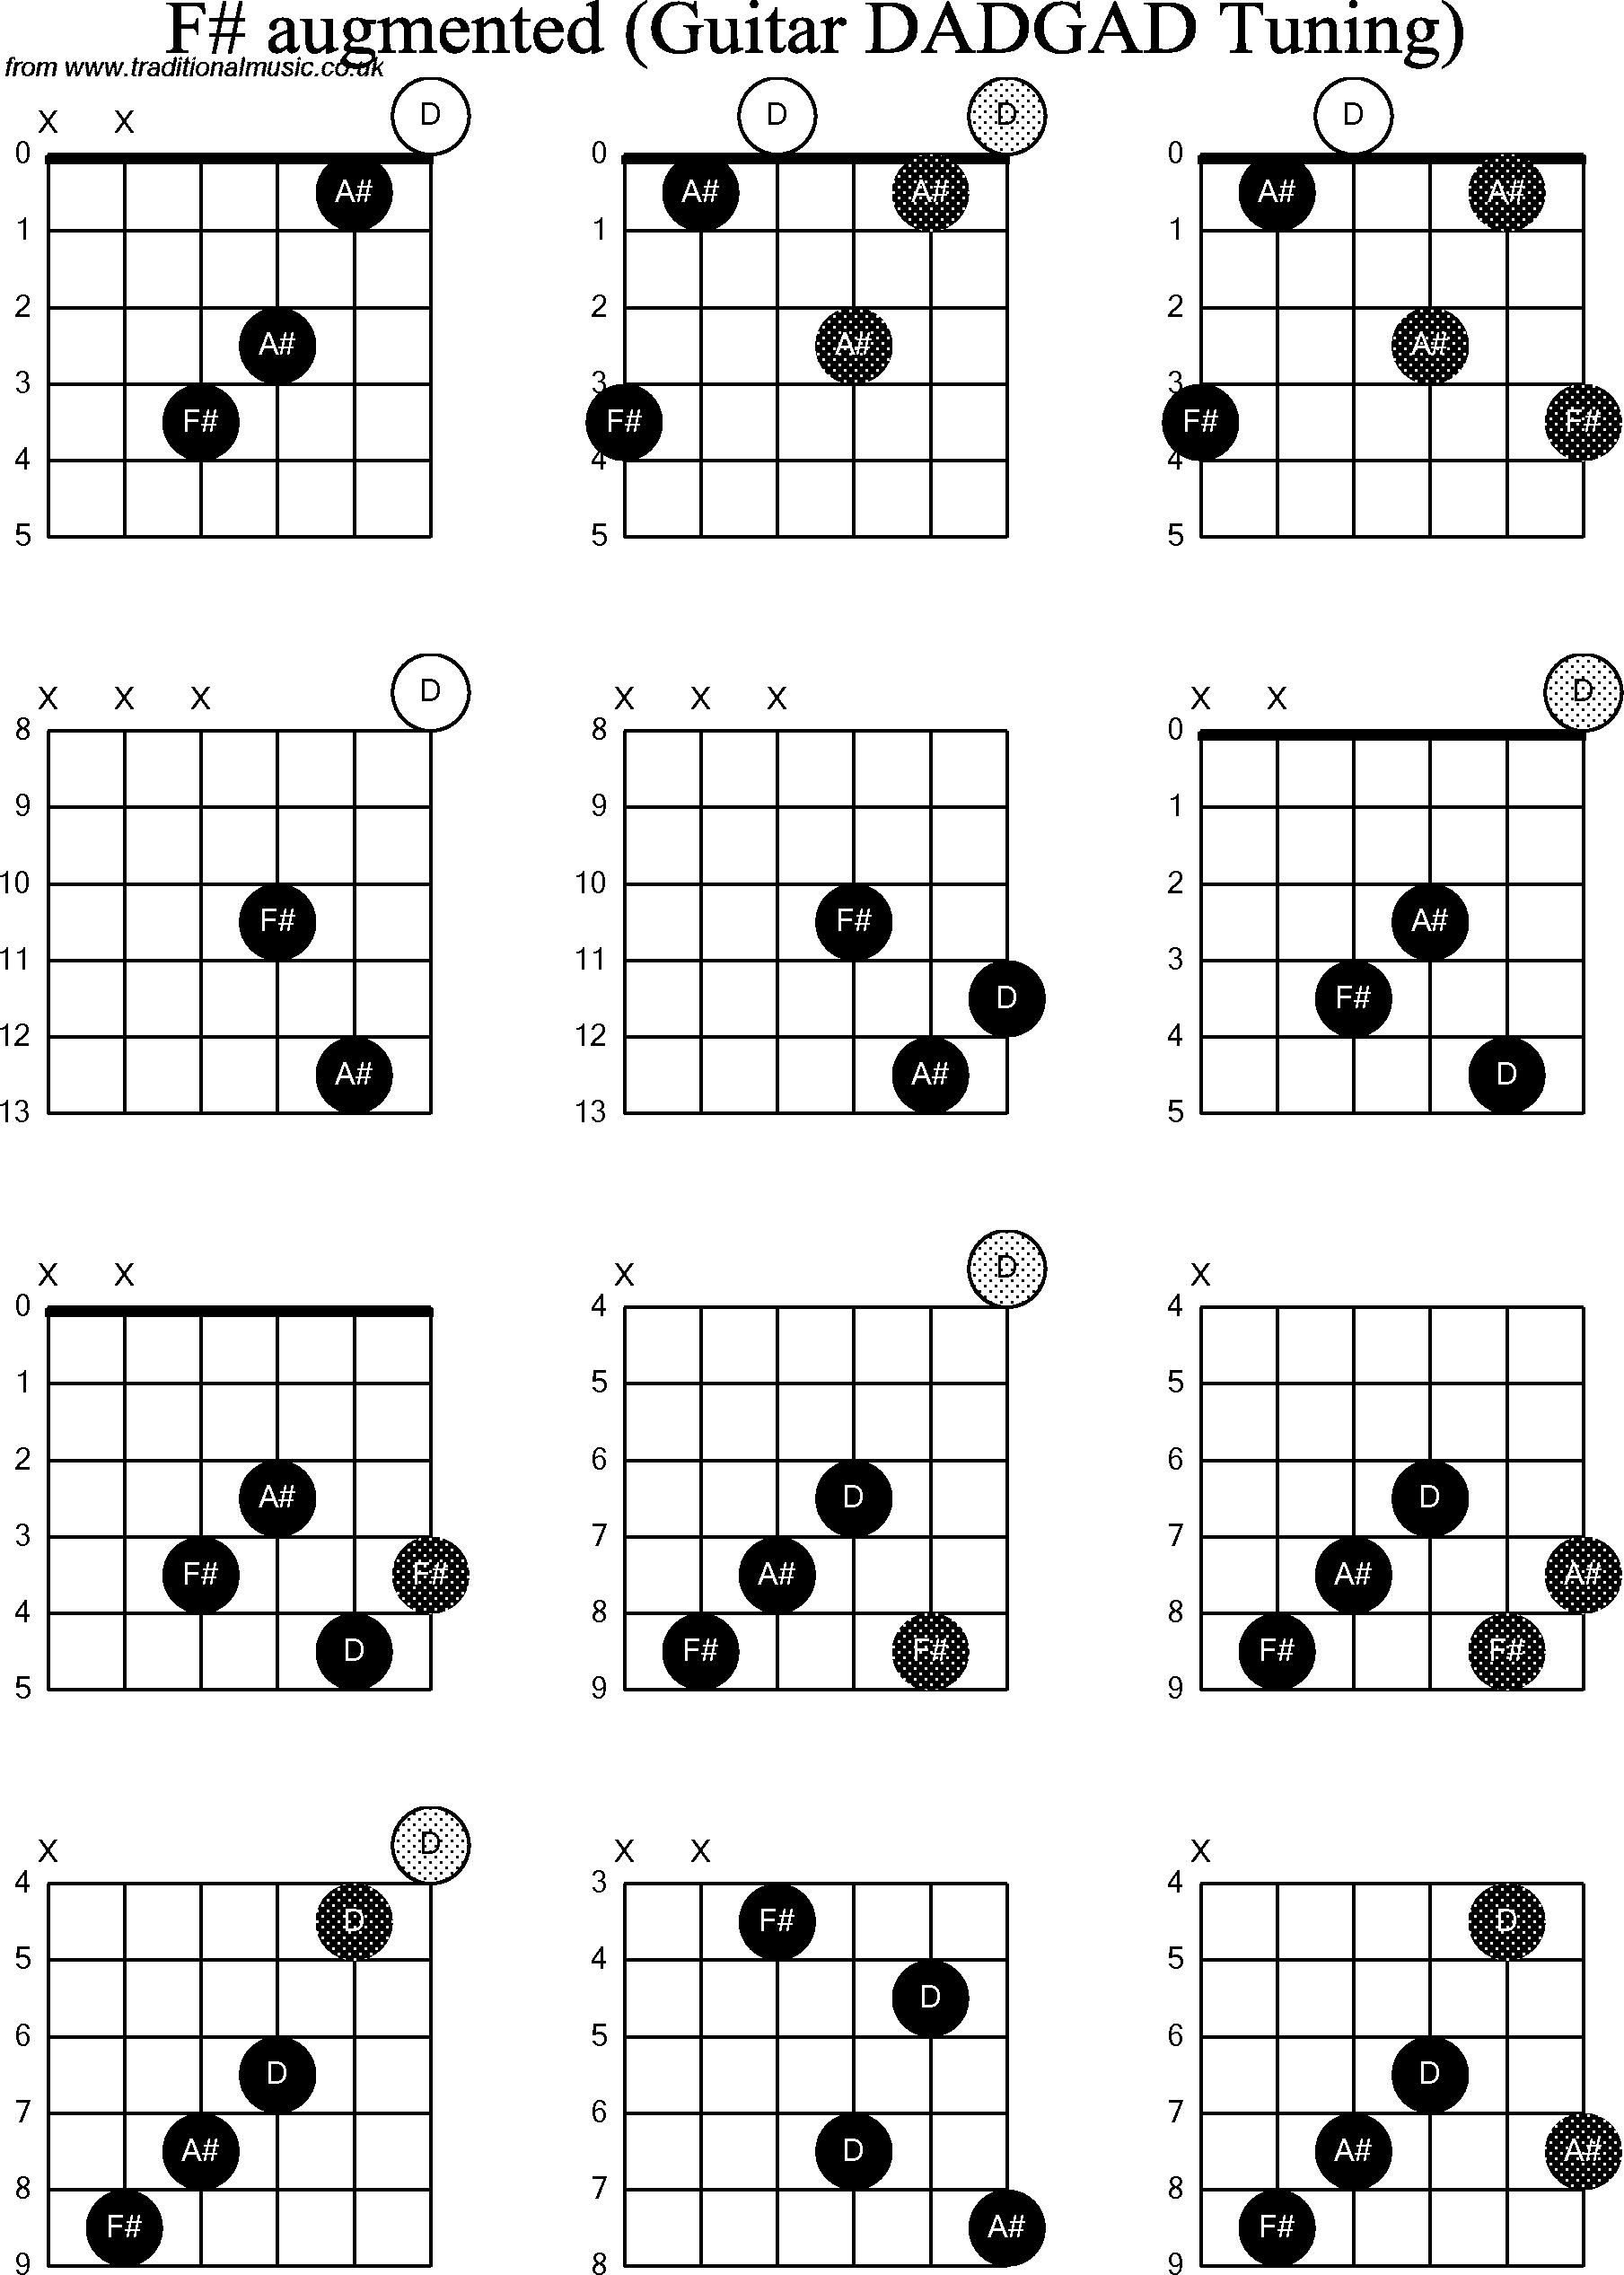 Chord diagrams D Modal Guitar( DADGAD): F Sharp Augmented